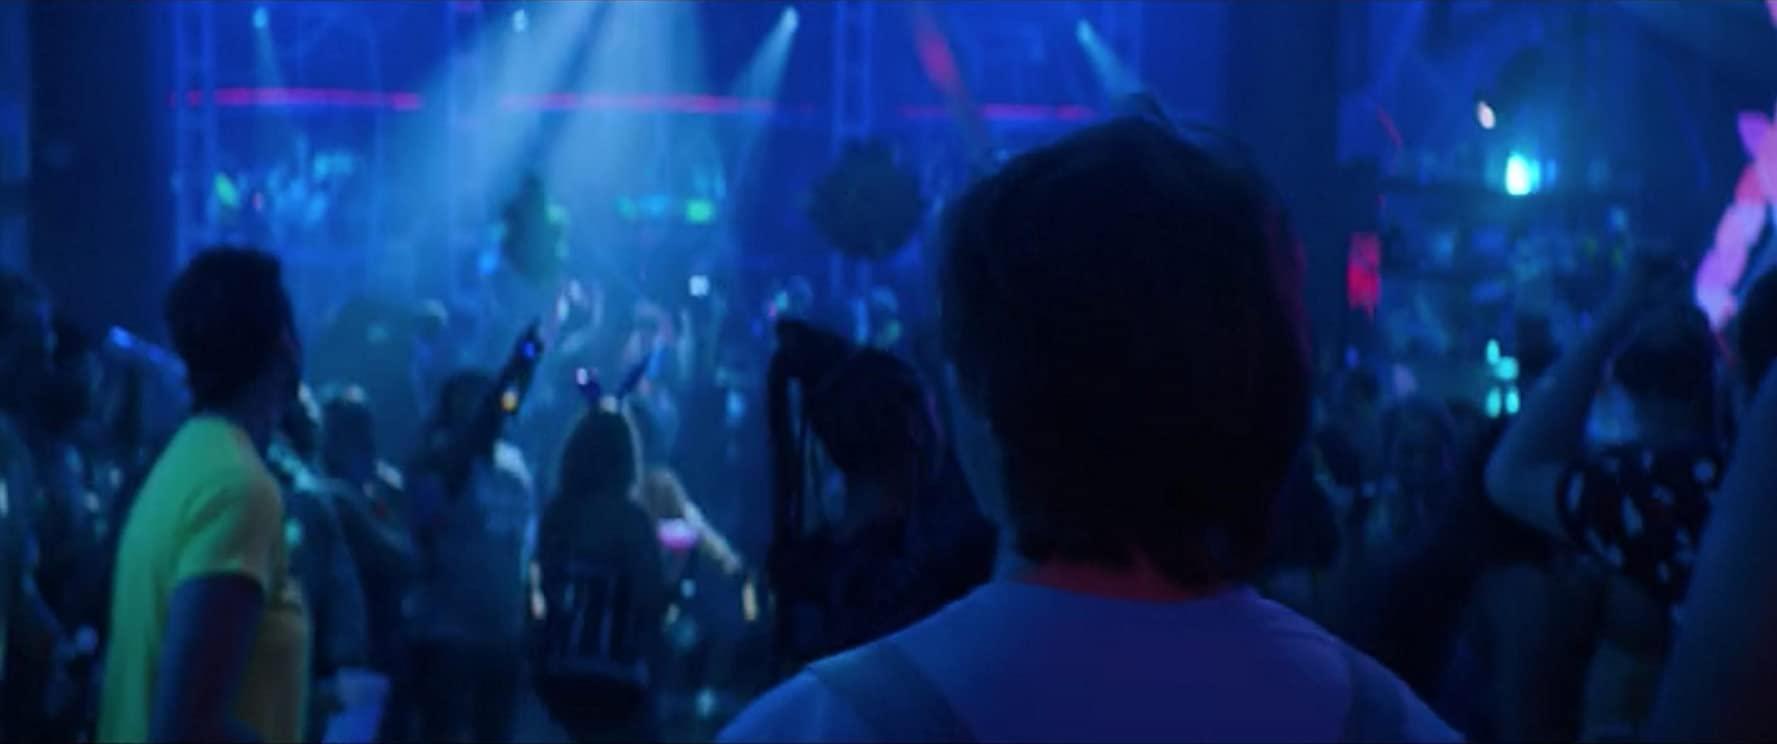 مشاهدة فيلم The Binge (2020) مترجم HD اون لاين